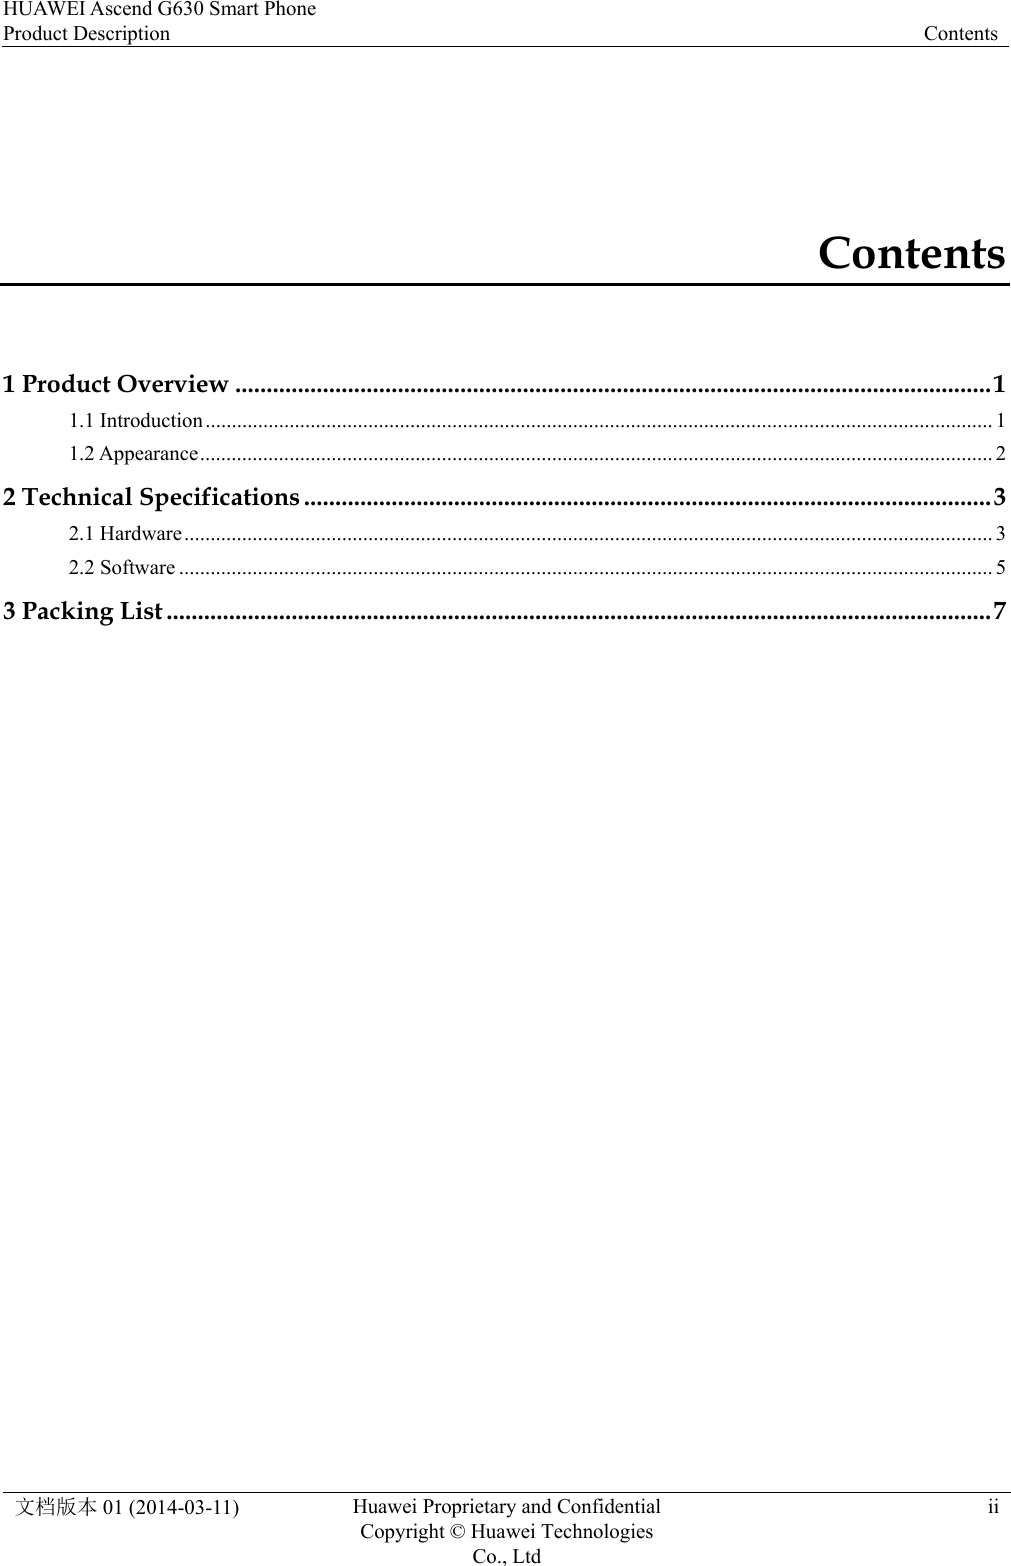 Huawei Ascend G630(G630 U10) Product Description (V100R001